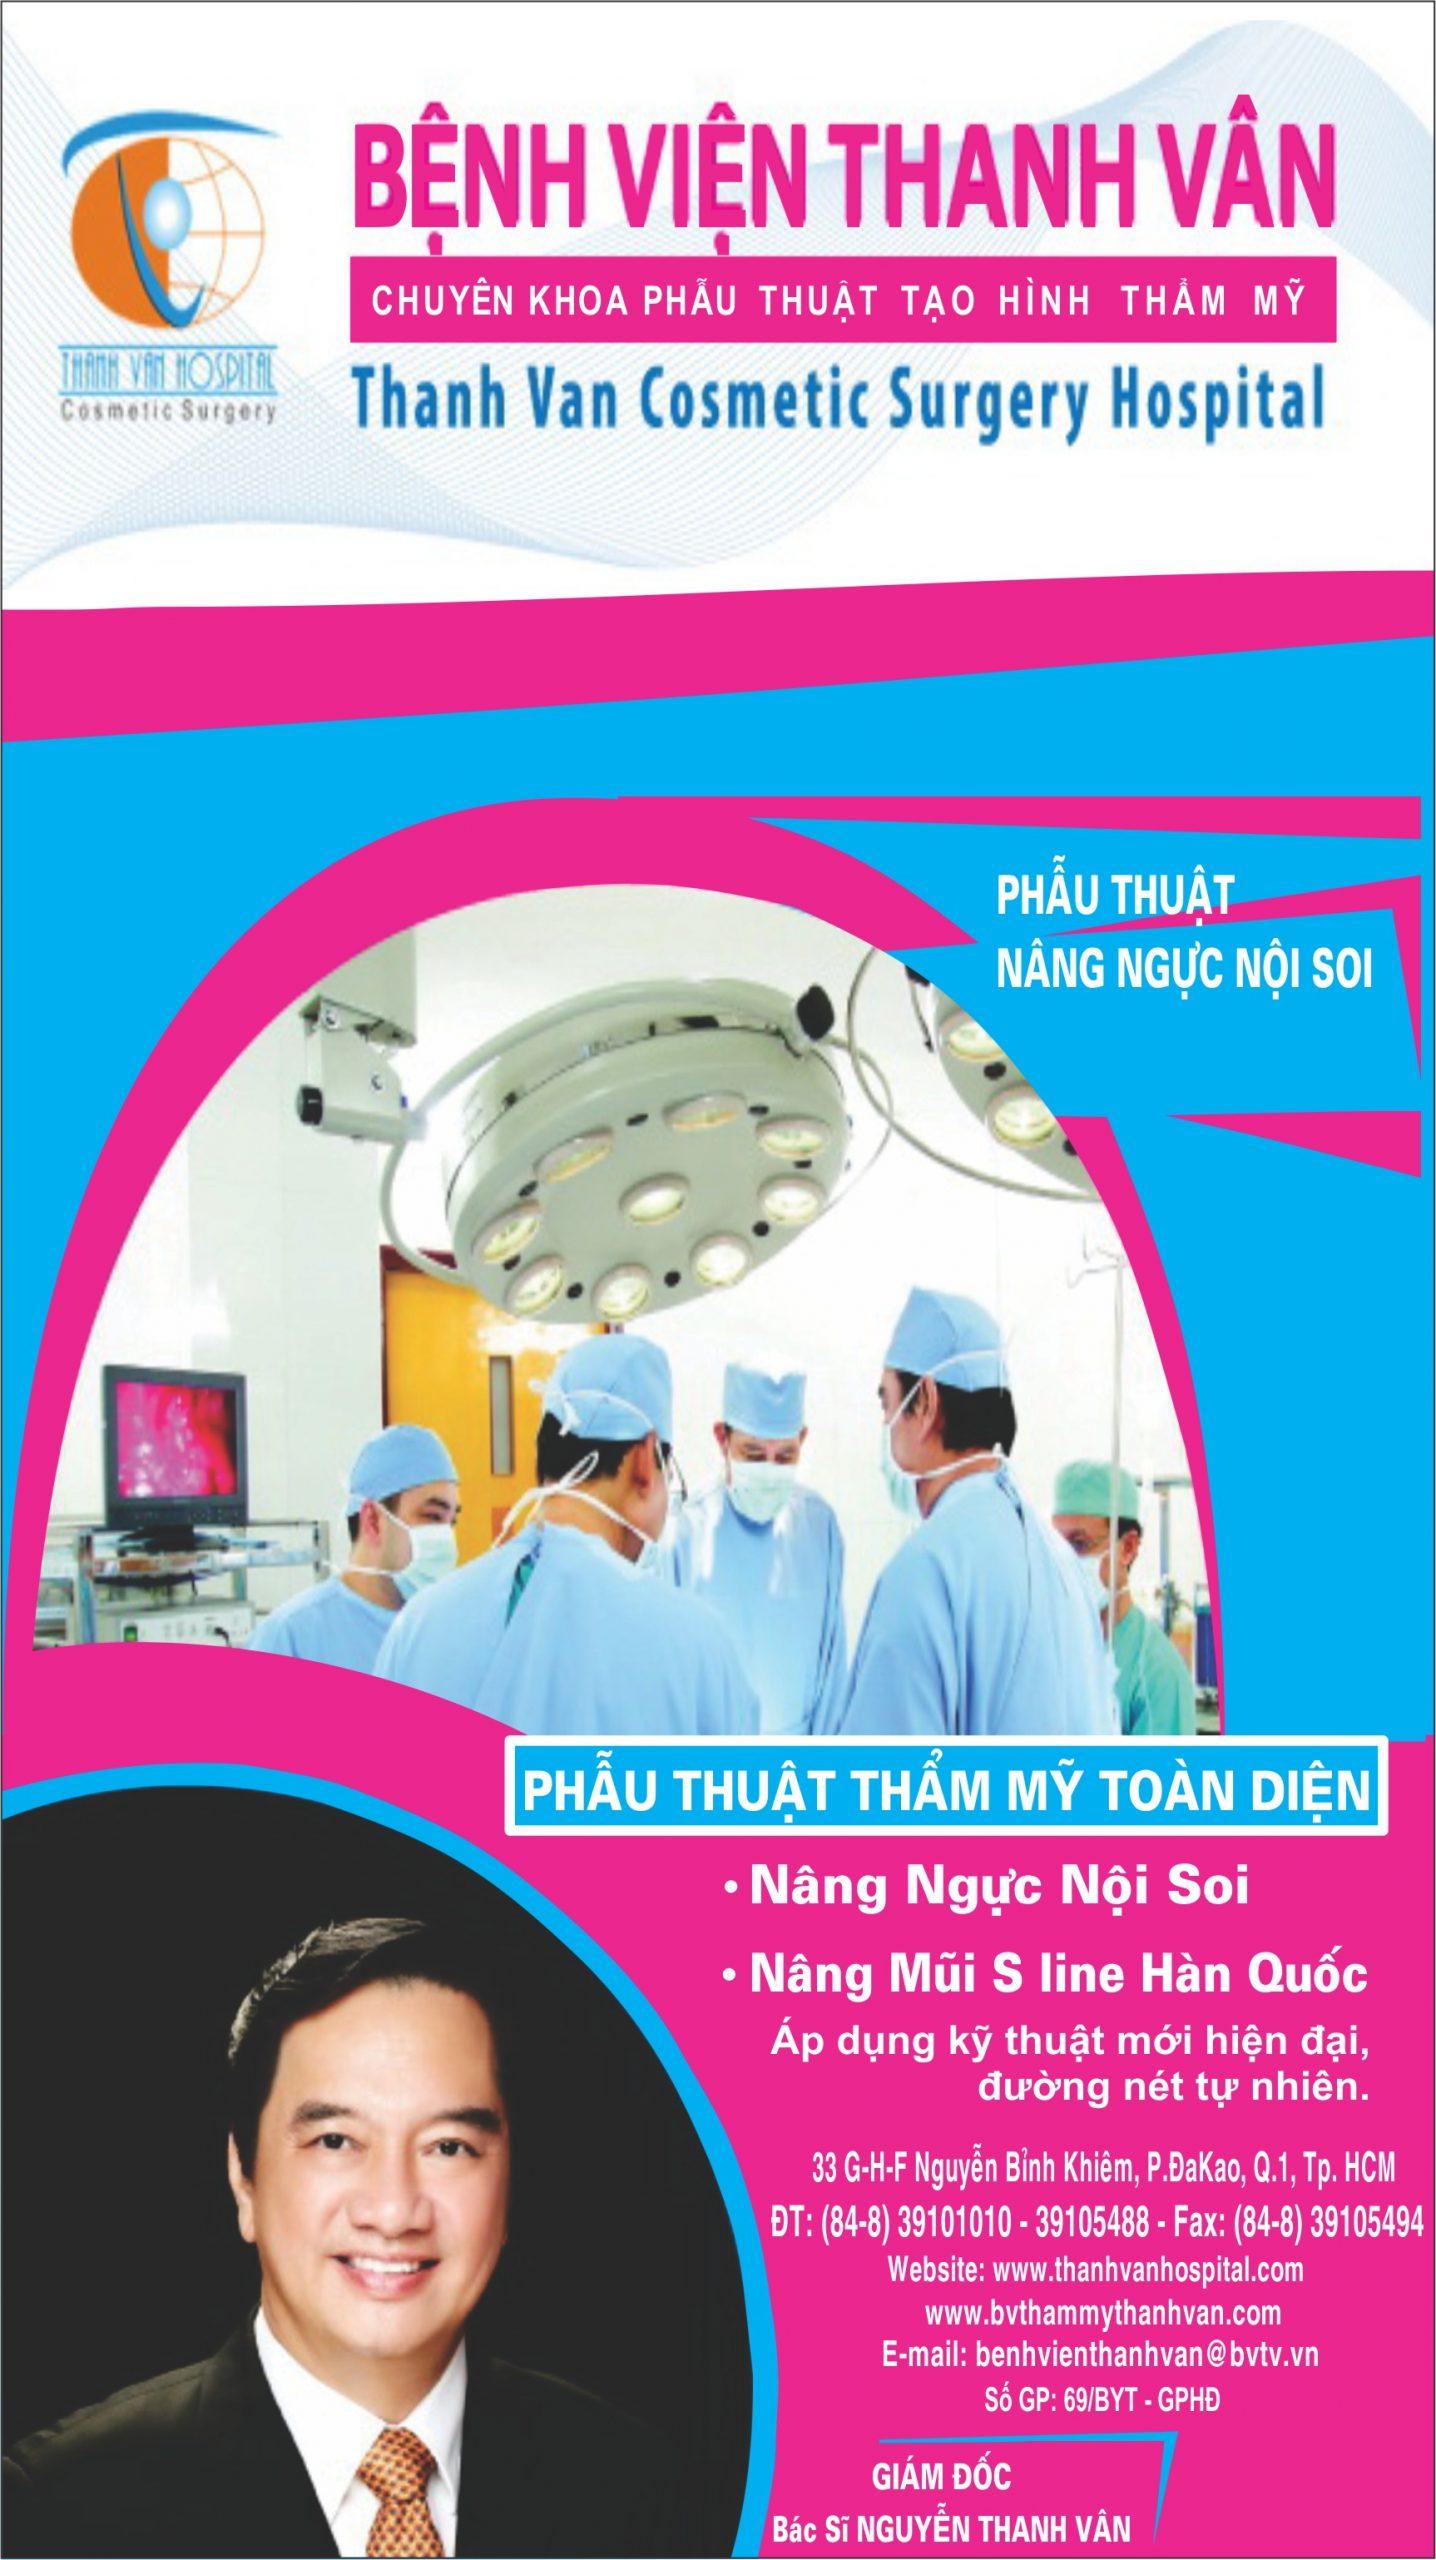 DR. Thanh Van